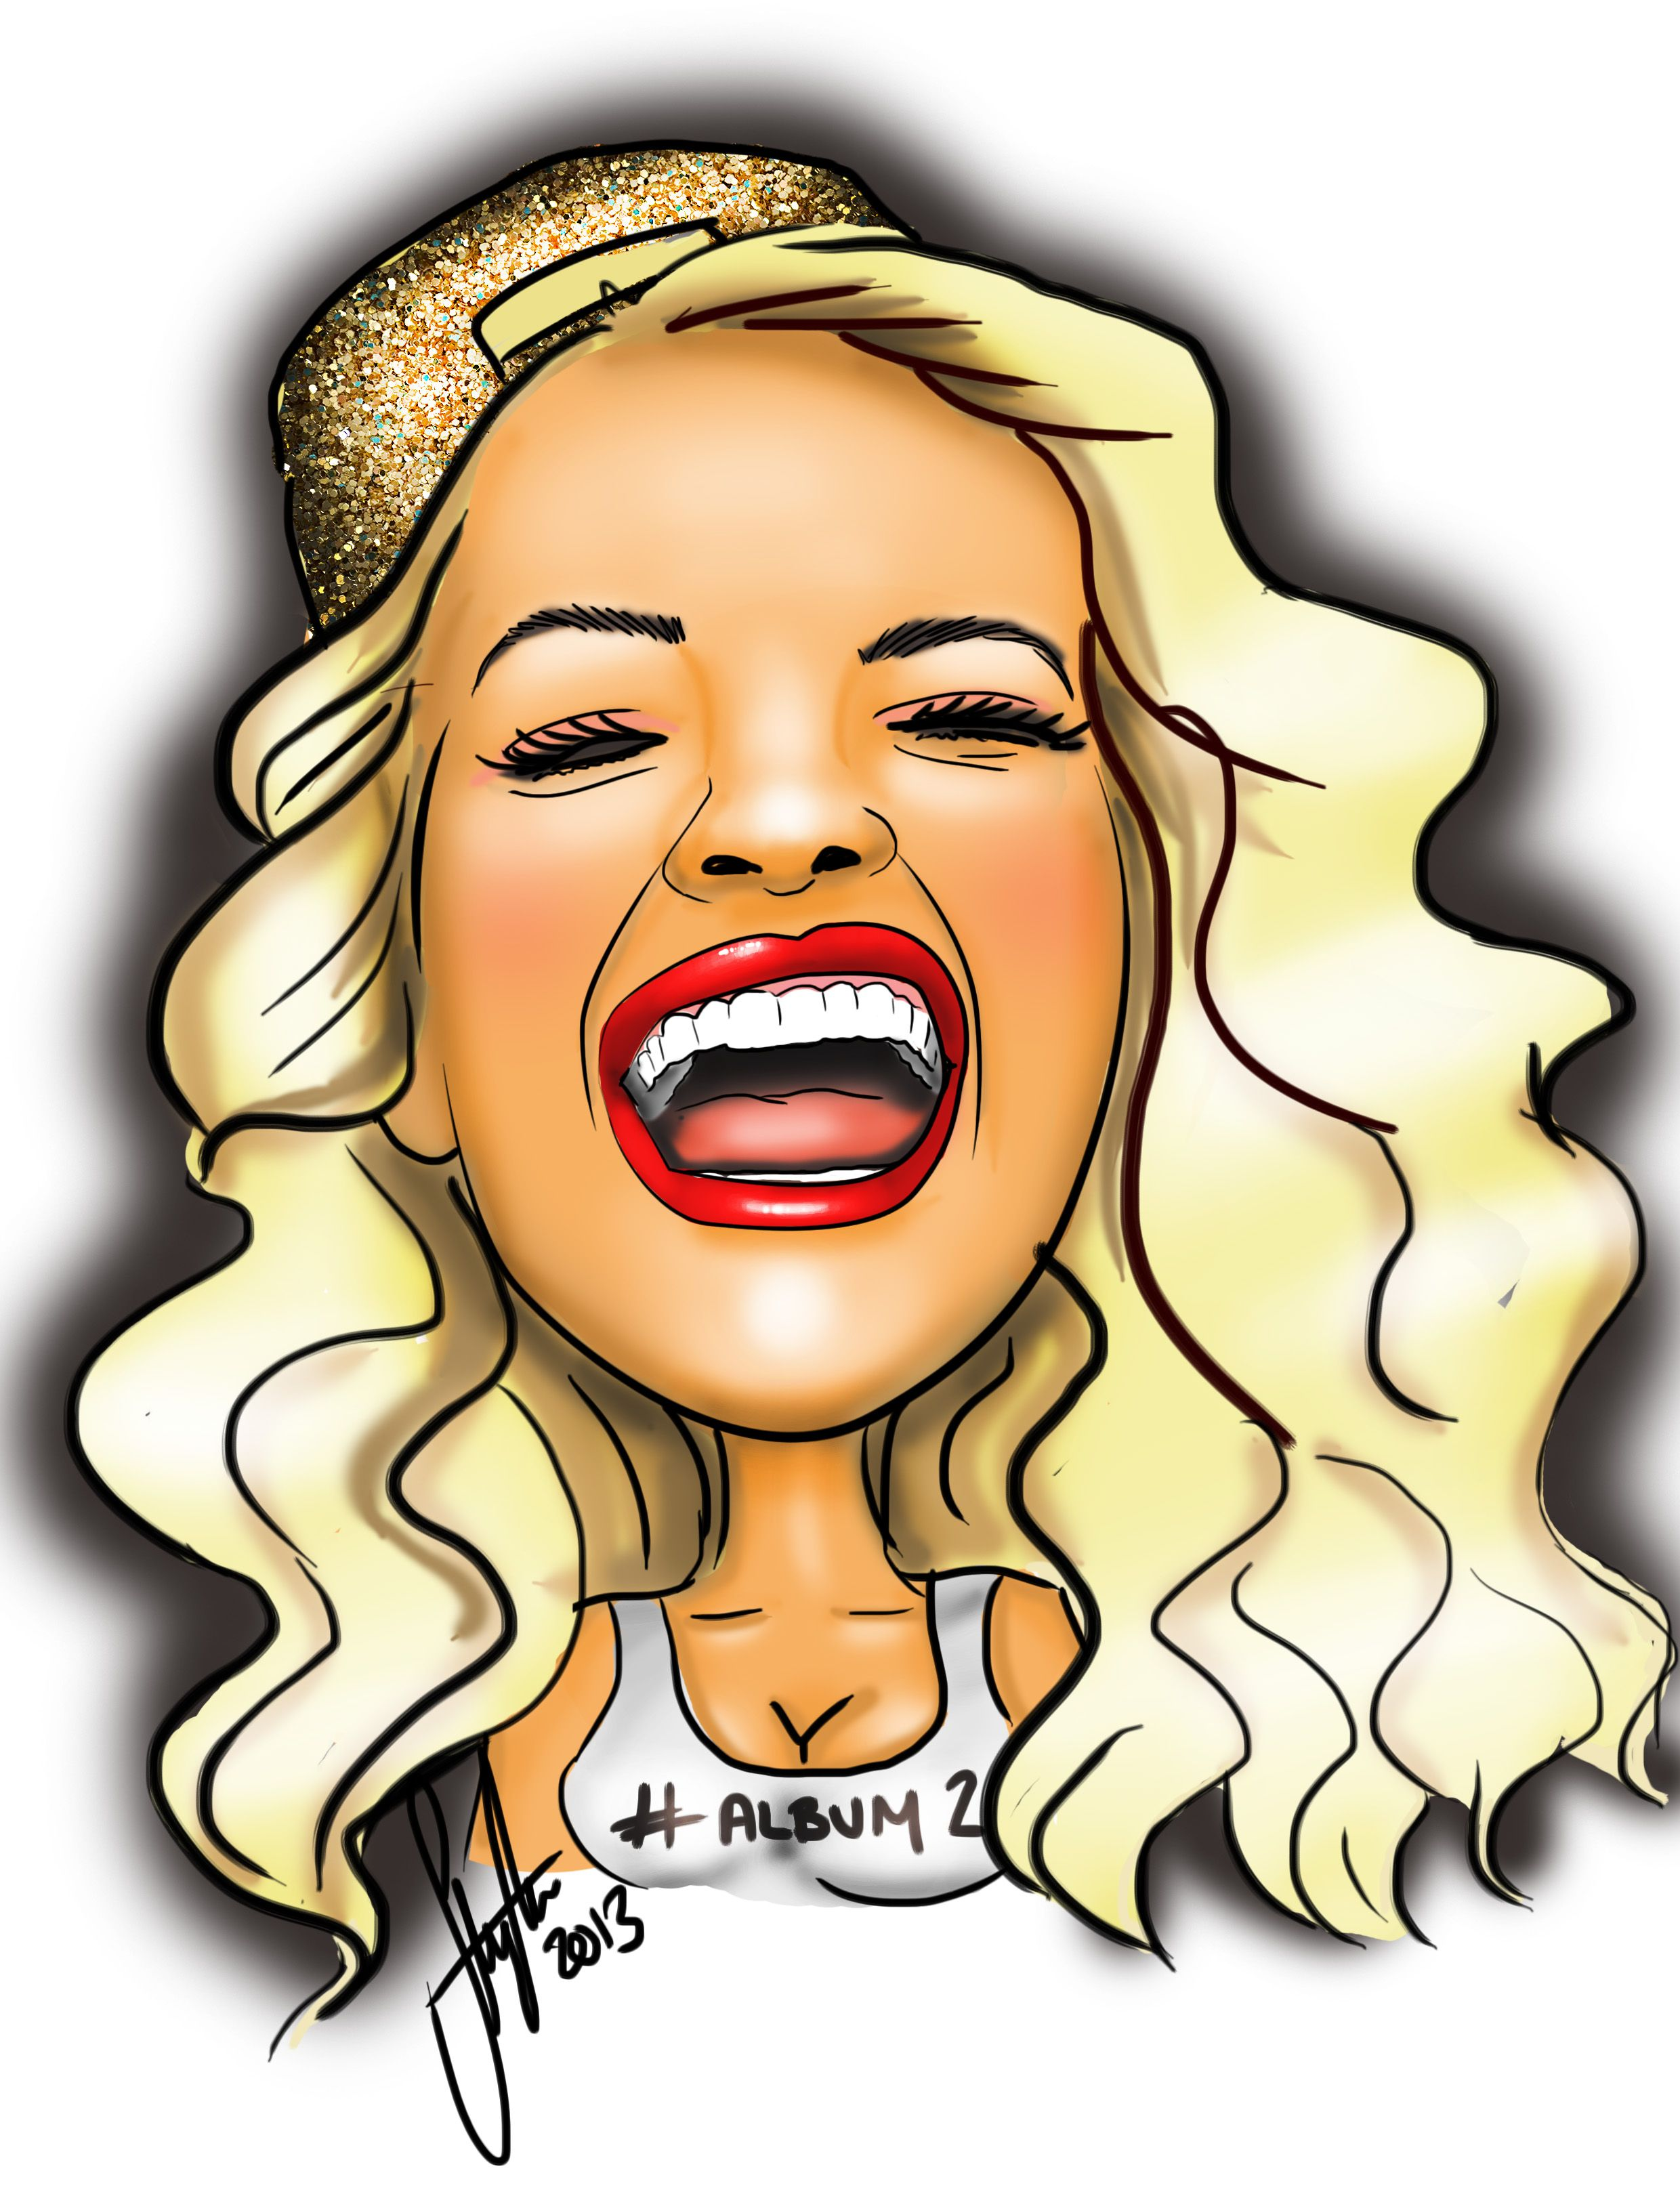 Rita Ora Celebrity illustration by Steph\'s Sketches www.